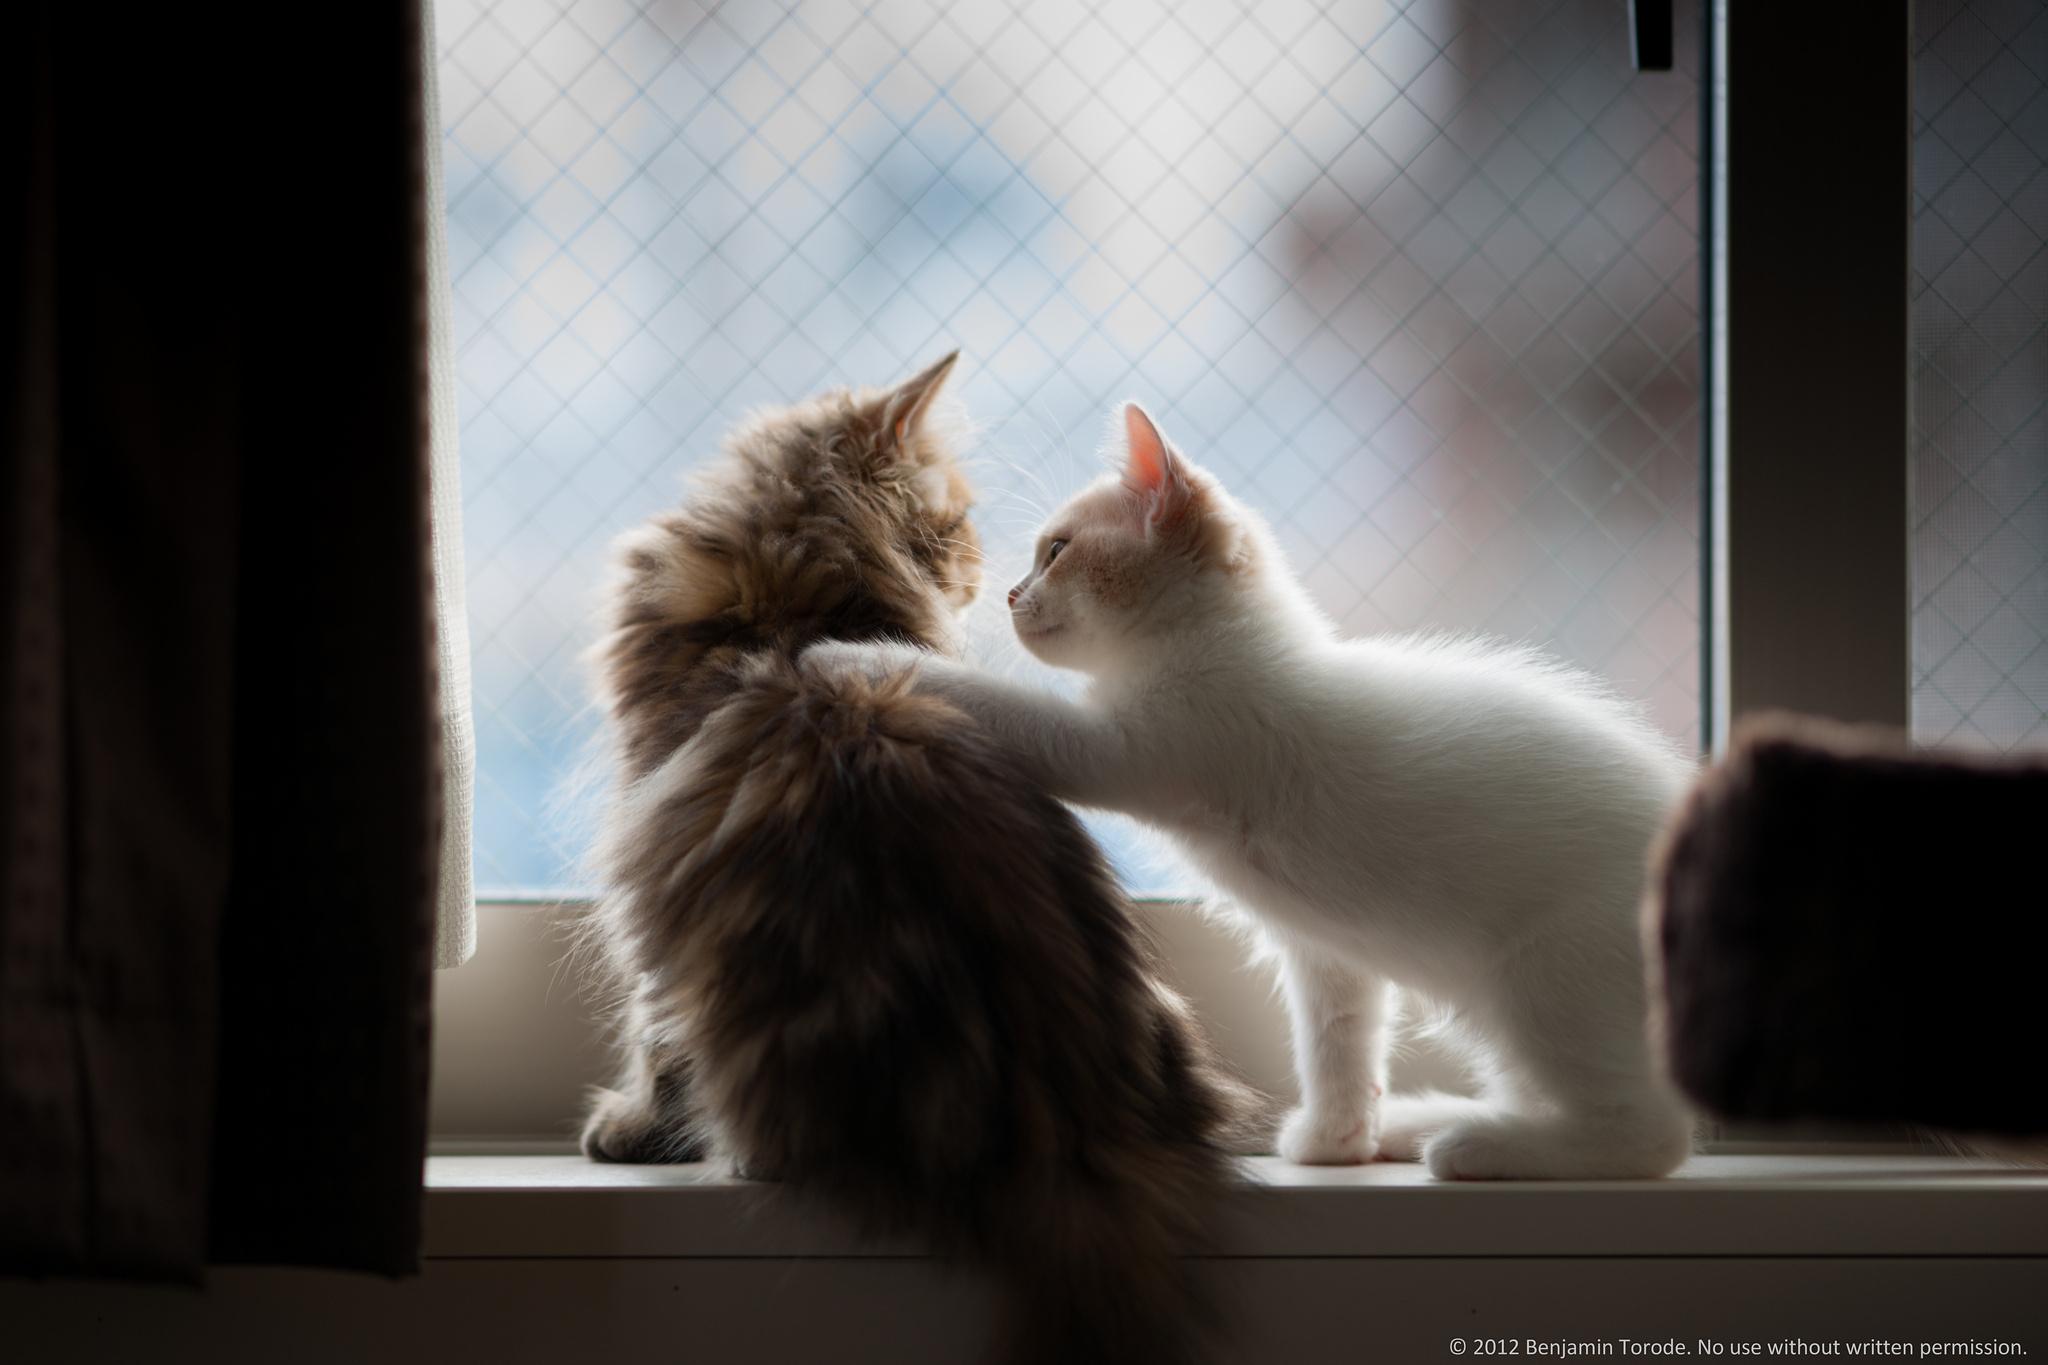 котята на окне kittens on the window  № 3063198 бесплатно